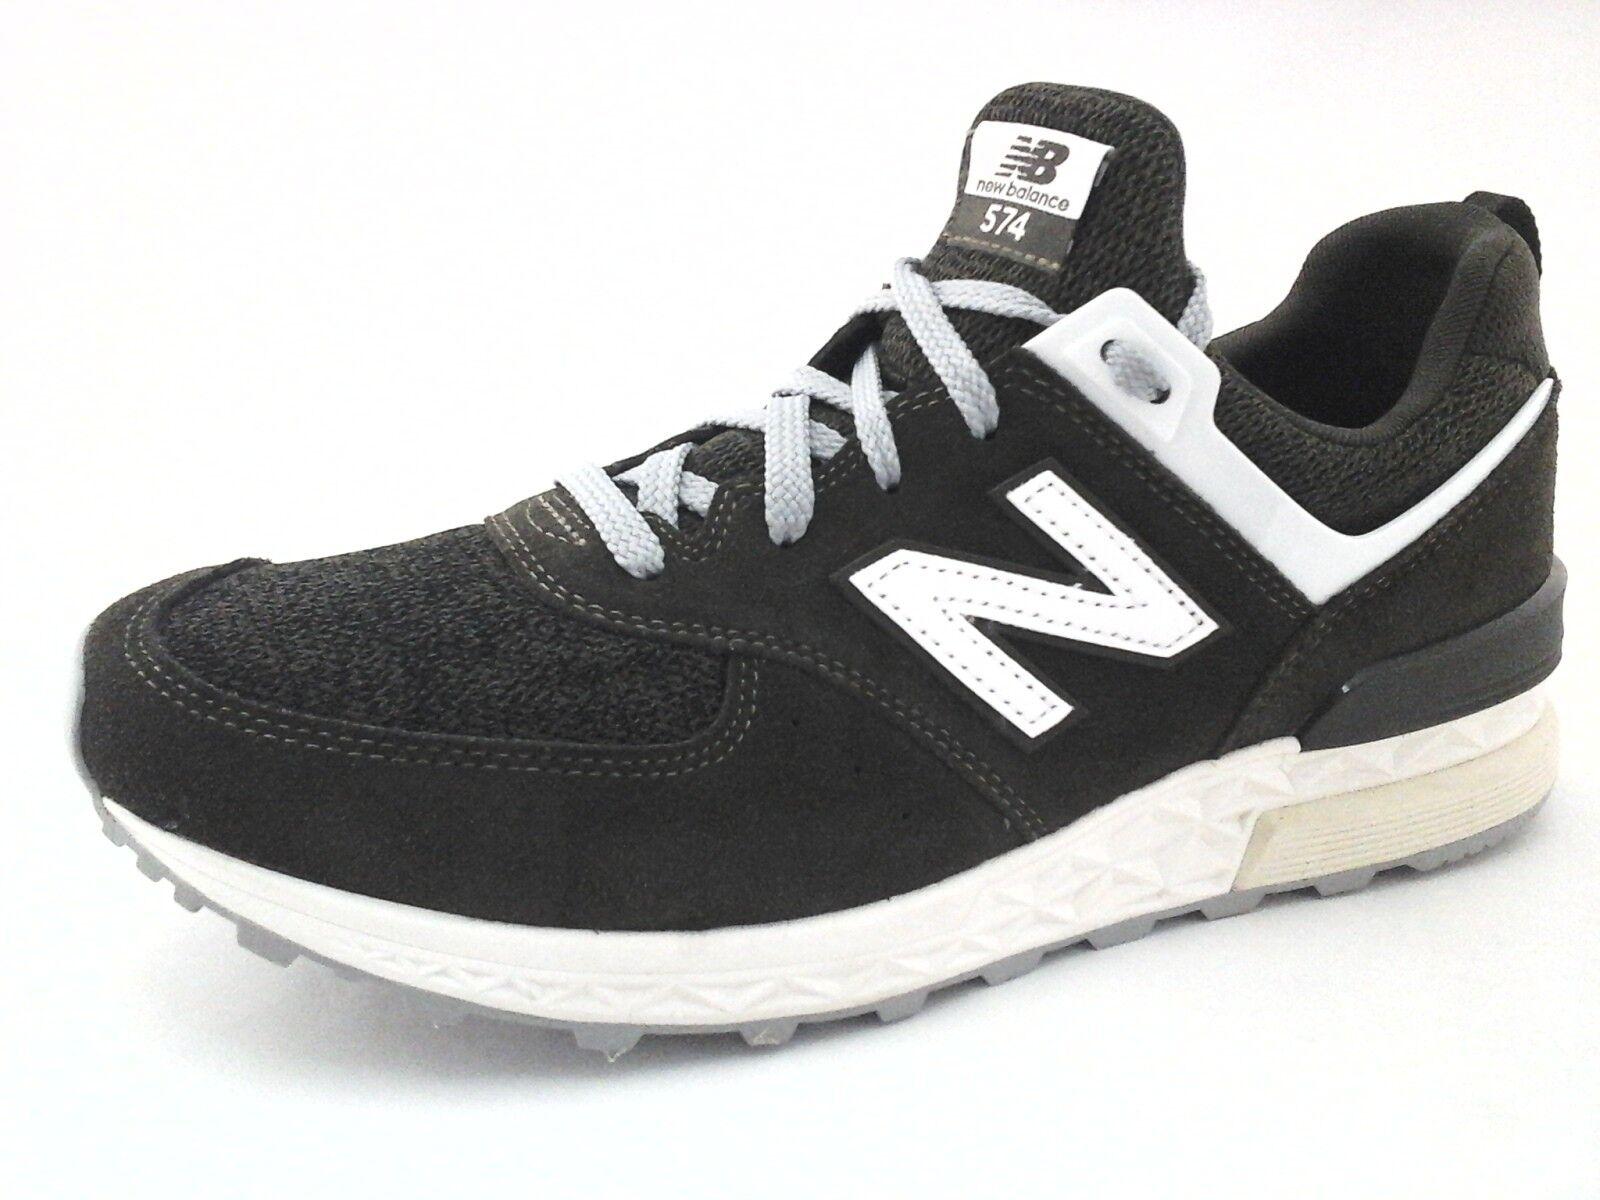 NEW BALANCE Sneakers 574 Fresh Foam Running Walking shoes Olive Green Men's  149